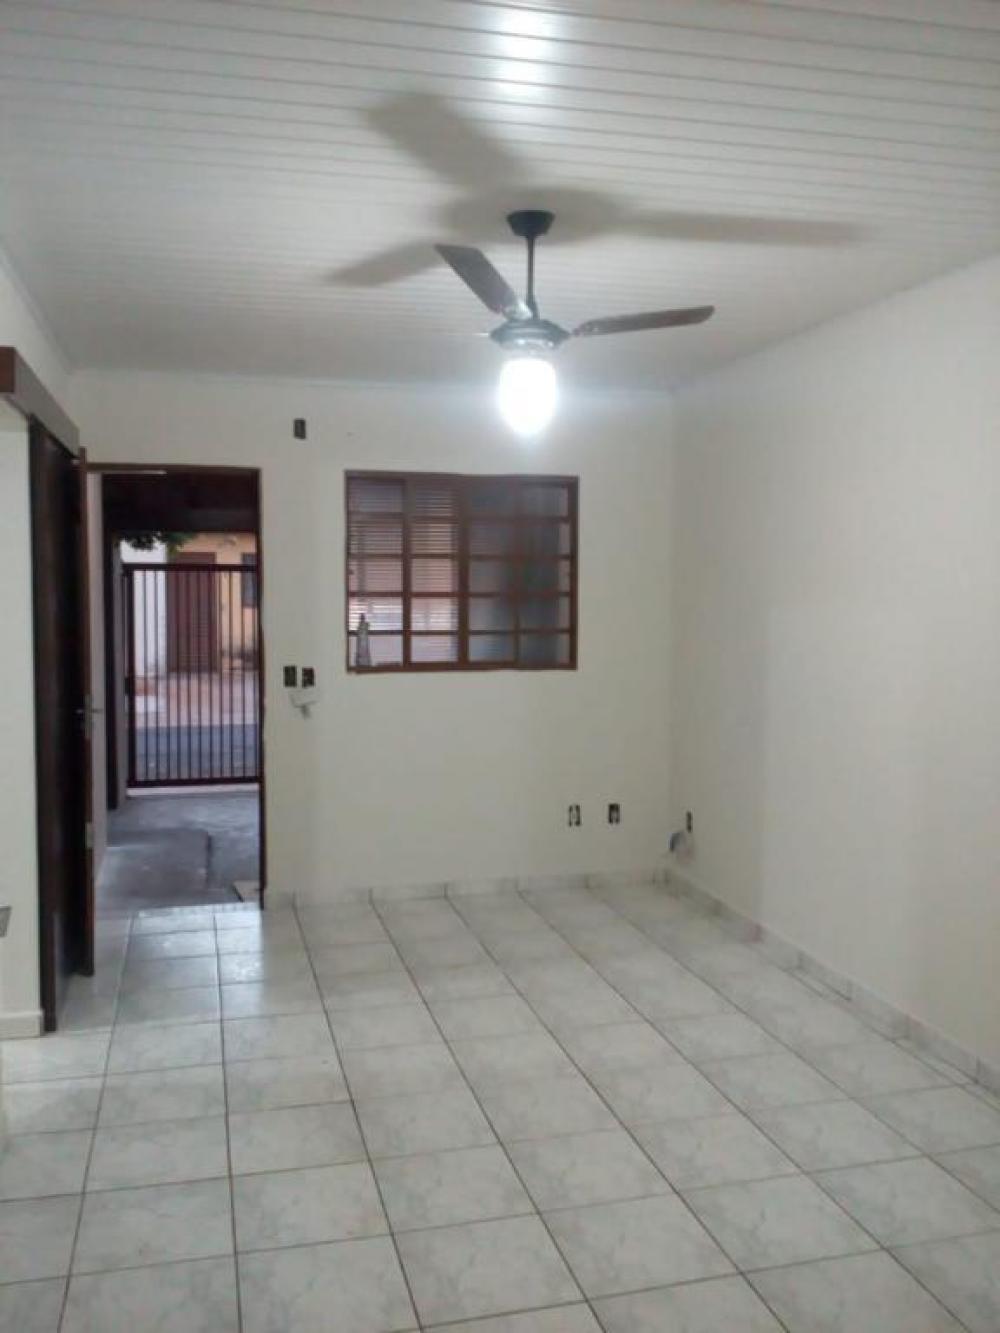 Comprar Casa / Condomínio em Mirassol R$ 168.000,00 - Foto 1